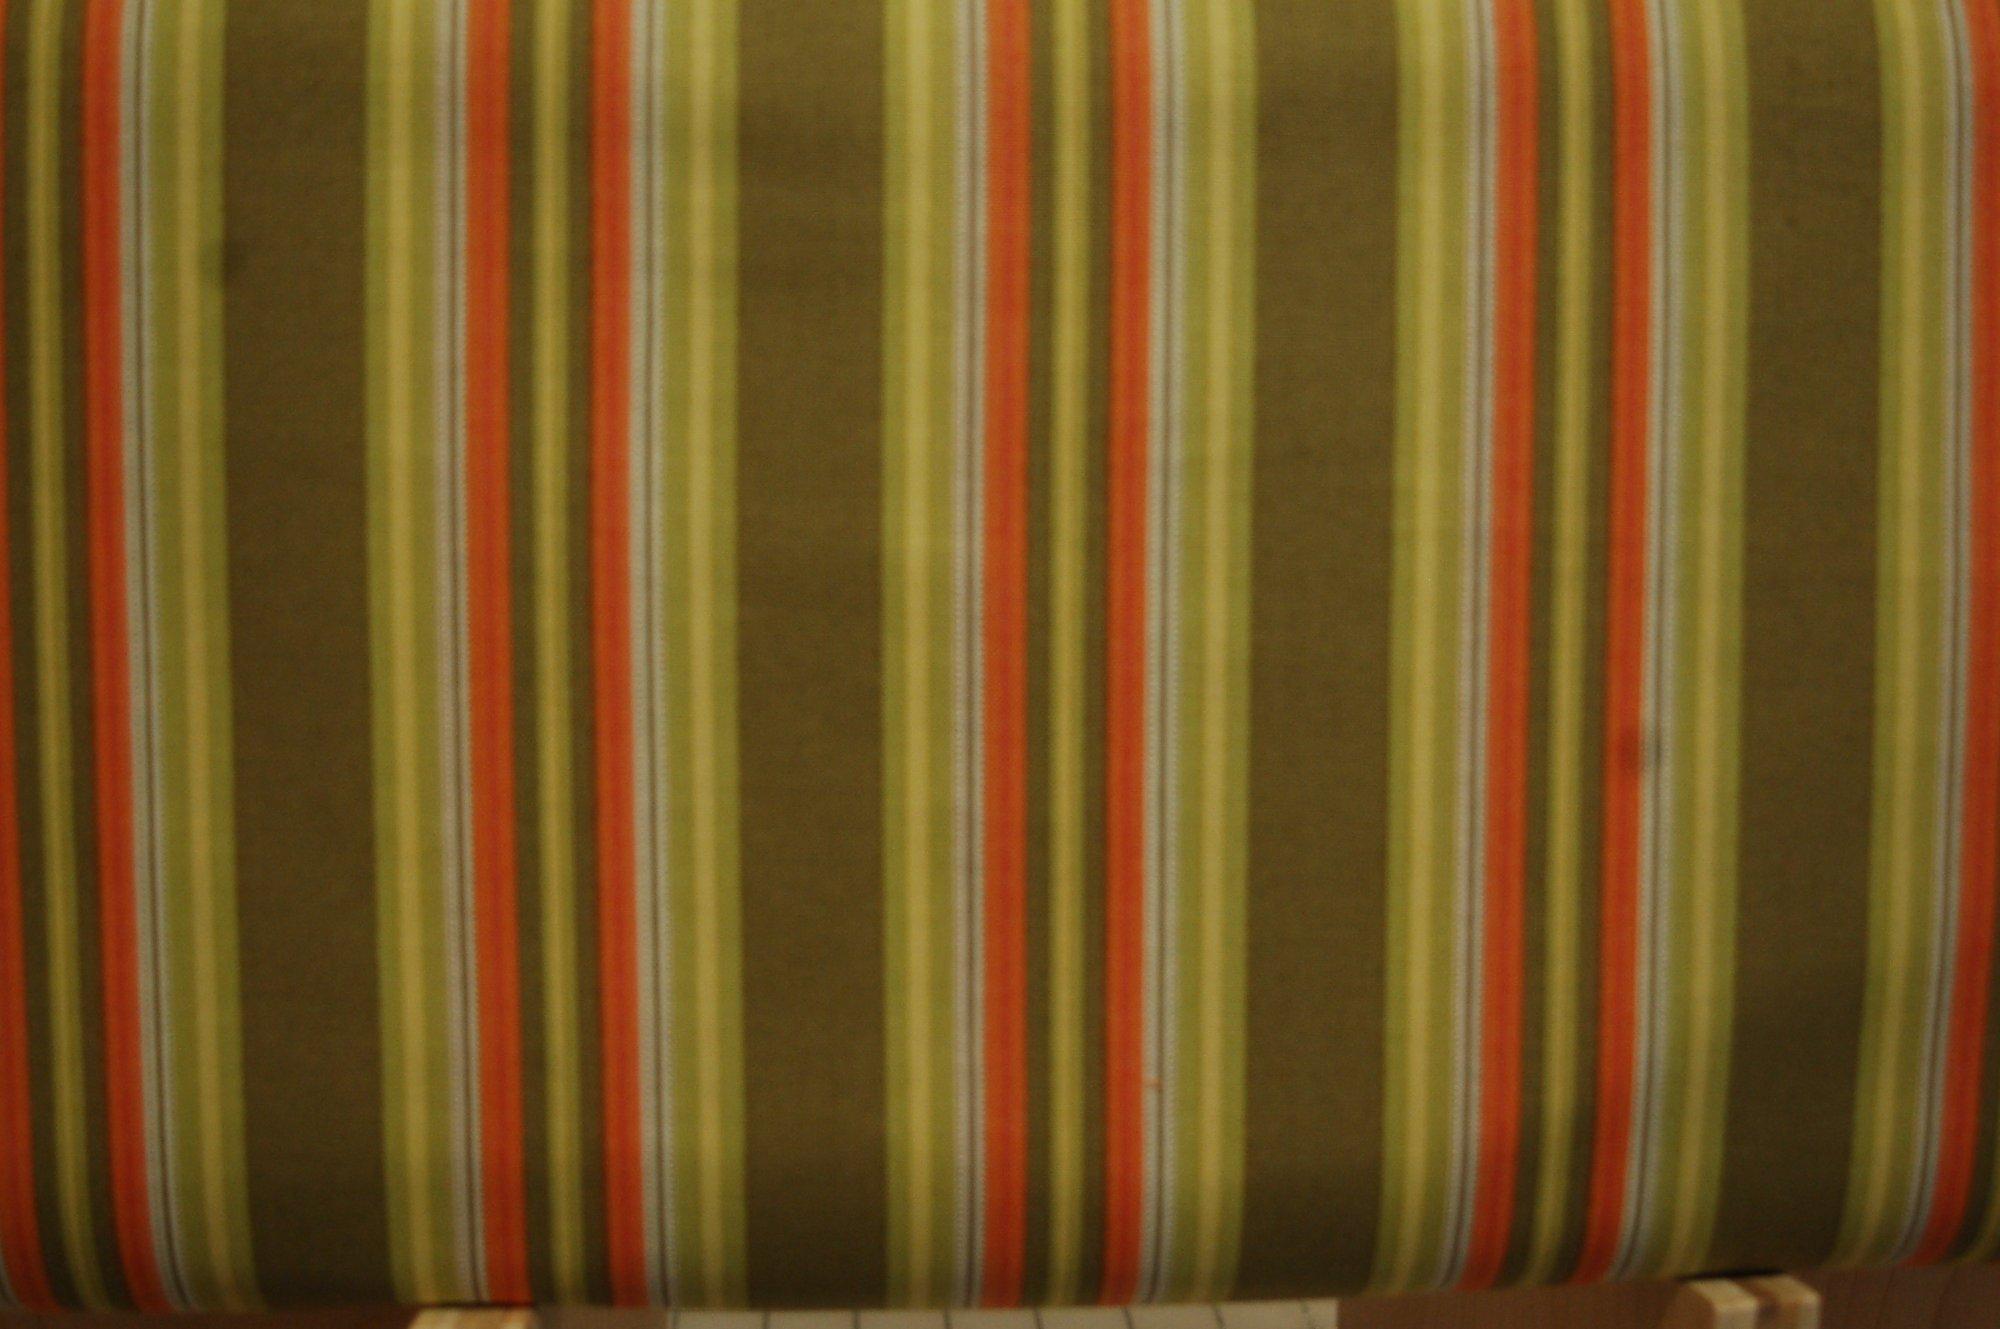 Gypsy Caravan - Hammock Stripe by Amy Butler for Free Spirit